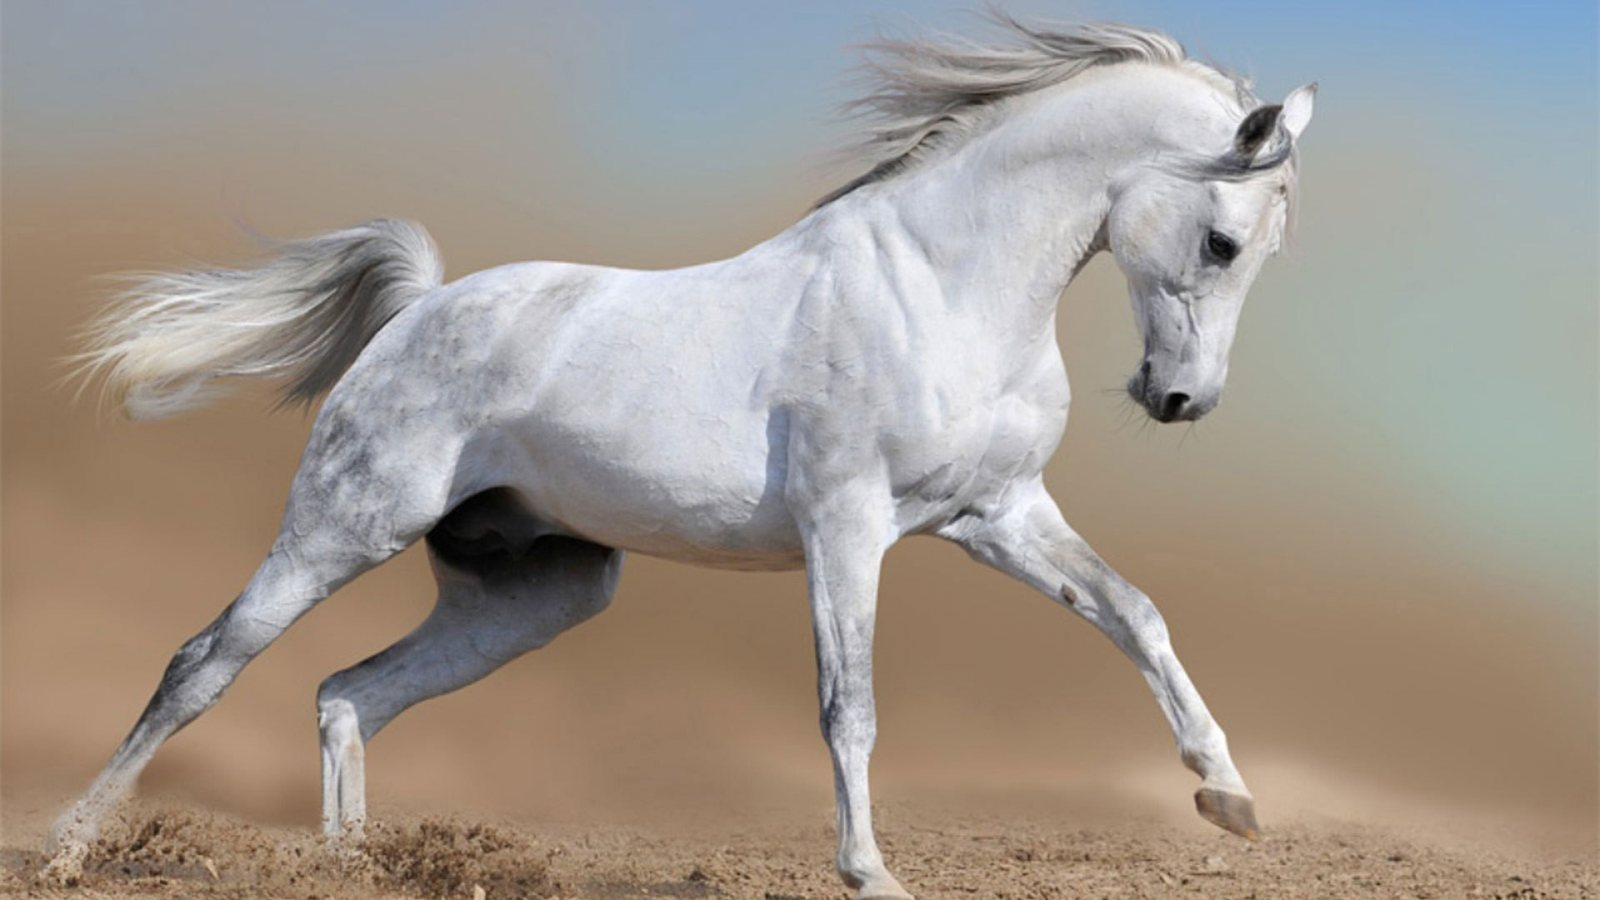 Must see   Wallpaper Horse Deviantart - horse+05  Image_312933.jpg